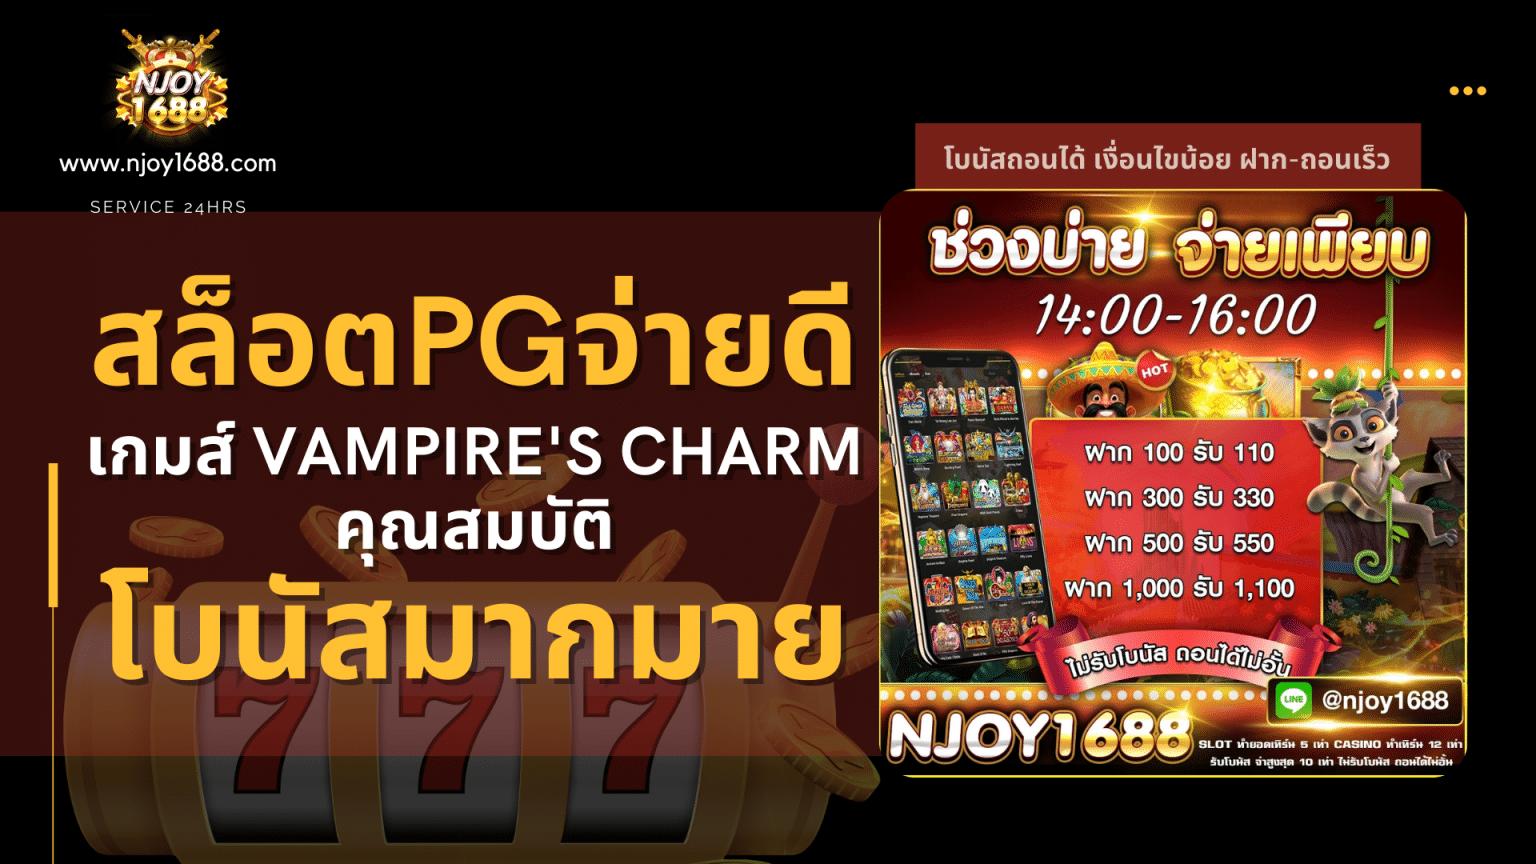 You are currently viewing สล็อตpgจ่ายดี เกมส์ Vampire's Charm คุณลักษณะโบนัสมากไม่น้อยเลยทีเดียว